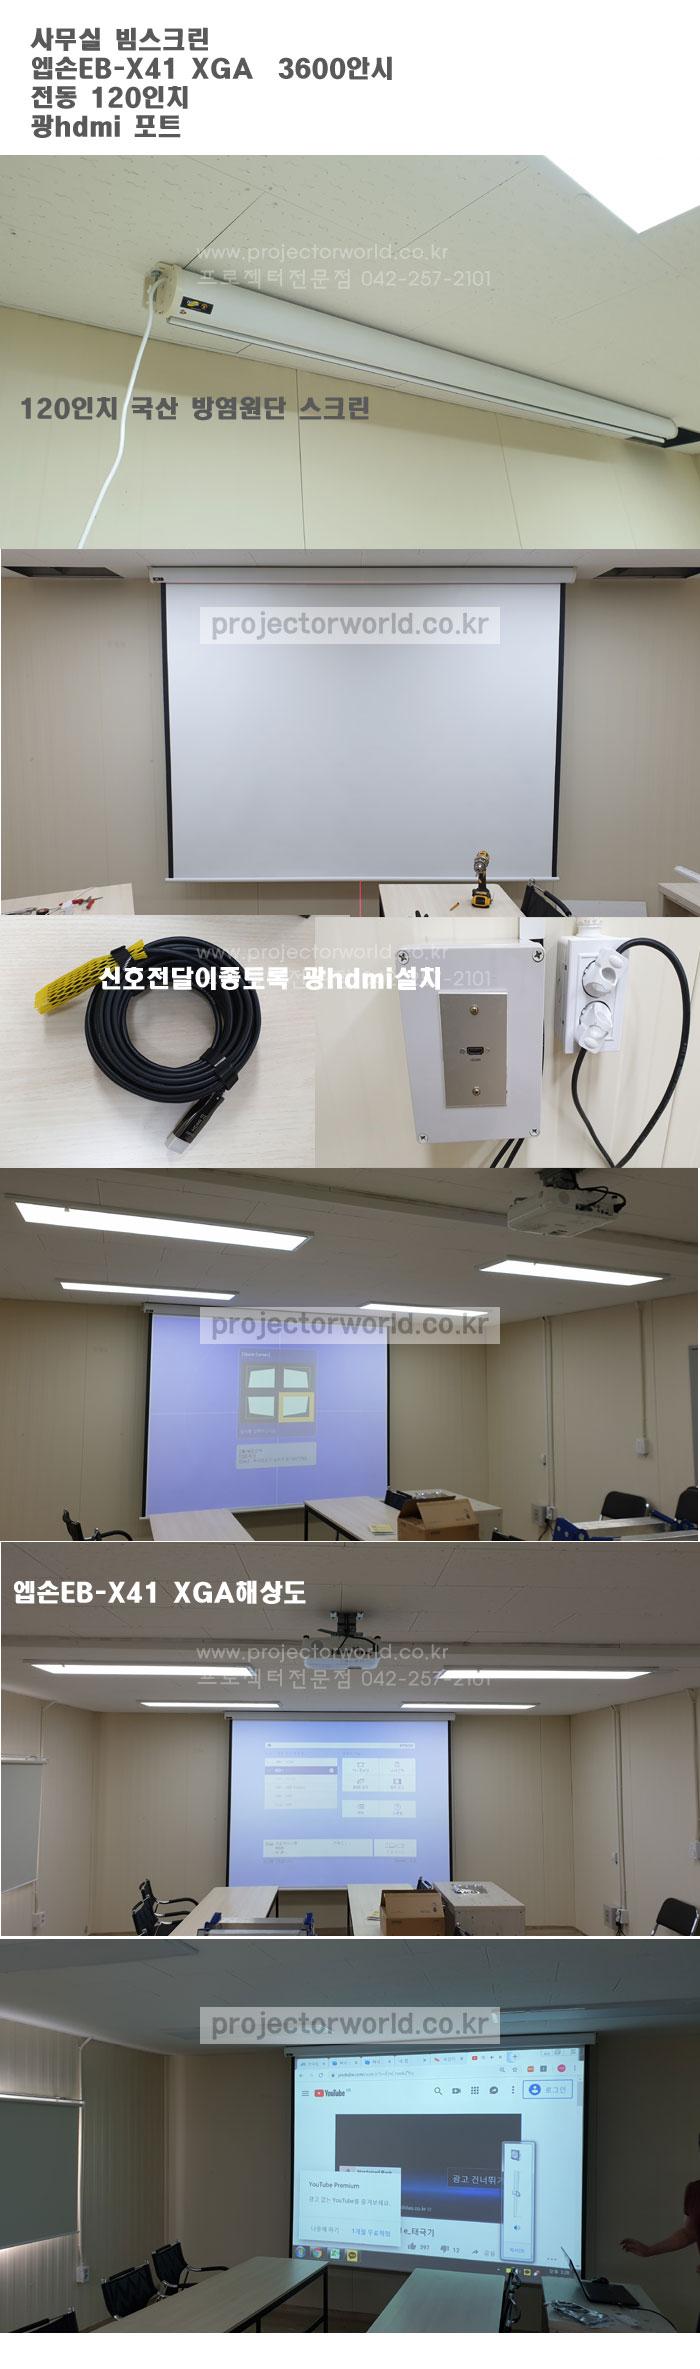 eb-x41,ku방염원단,hi-max,대전프로젝터,